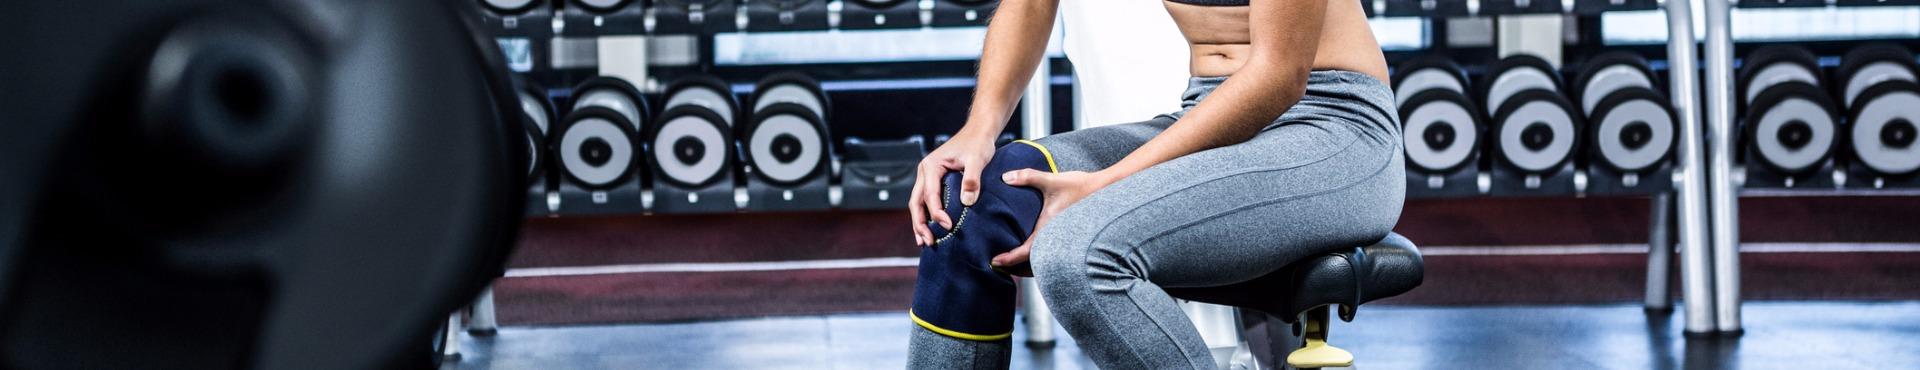 Fit woman having knee pain | Shine Lawyers